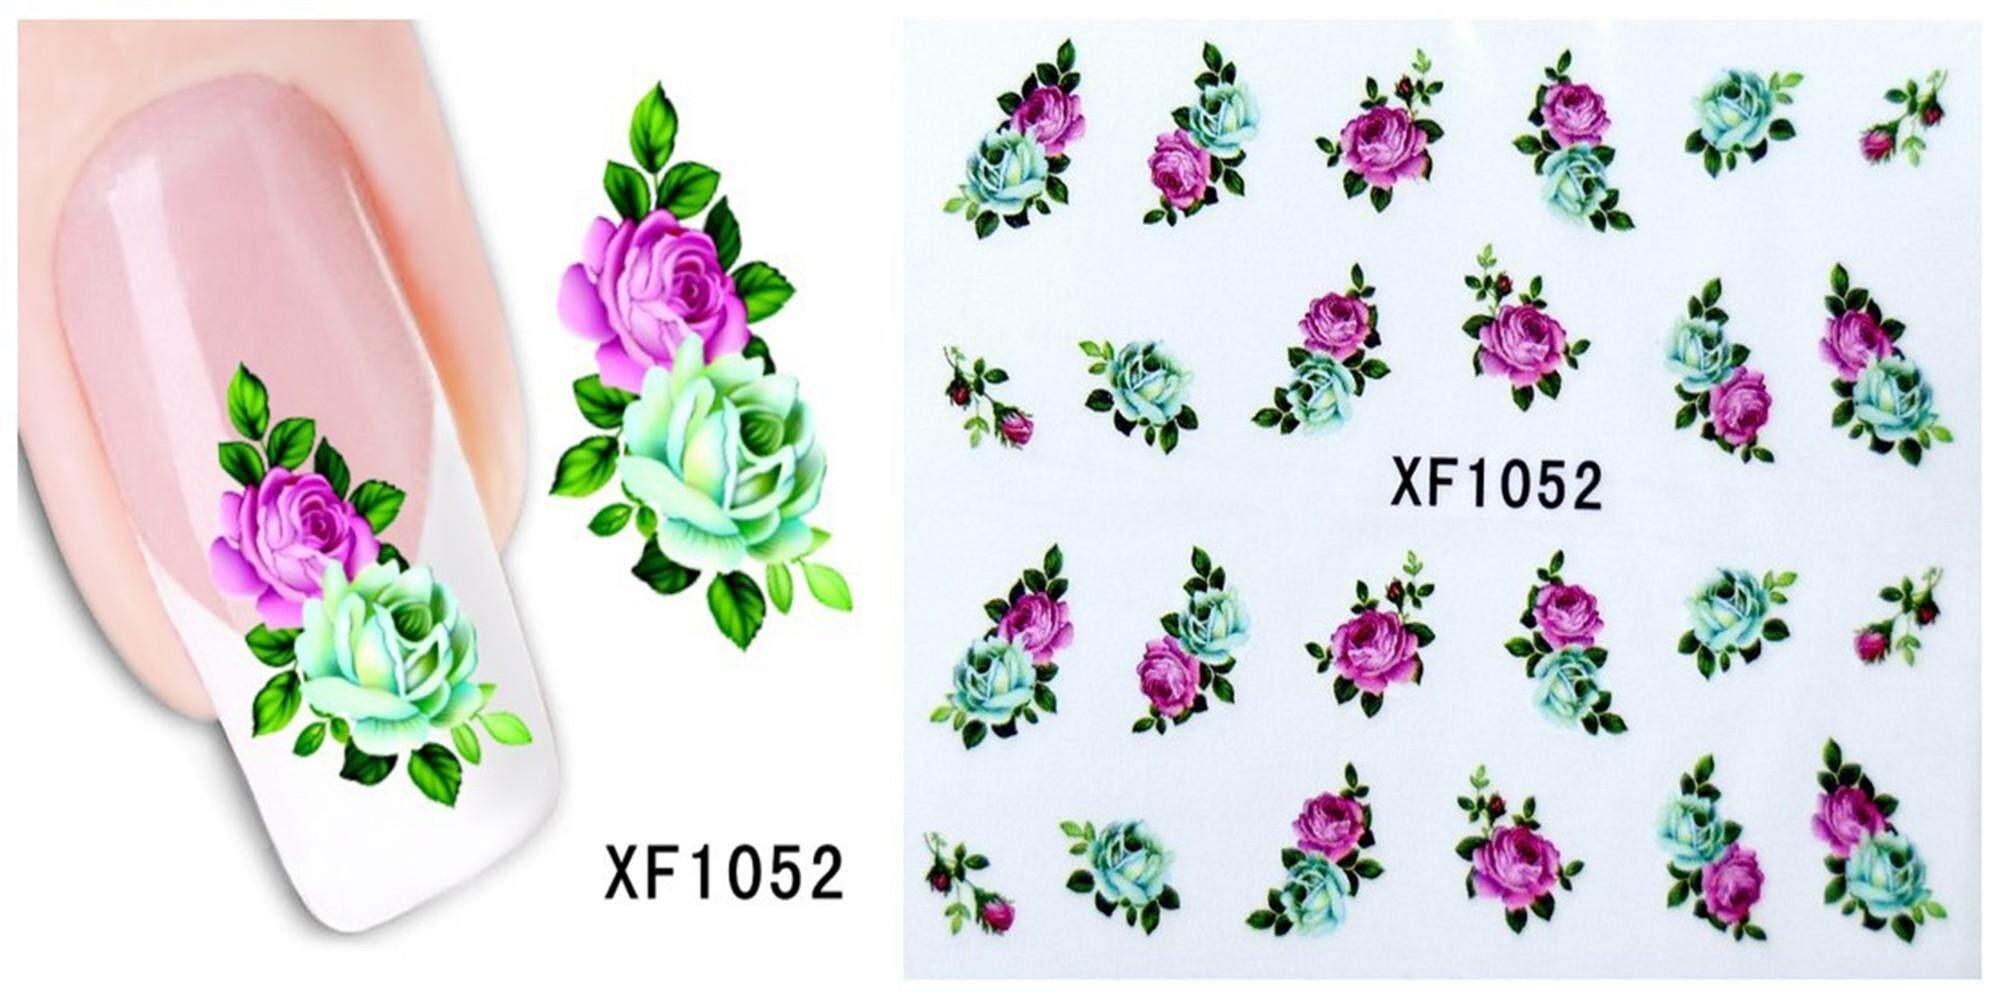 Transfers Nail Sticker Tatoo Various Flower 3D Nail Art Decals for Women Girls Gift Design 52